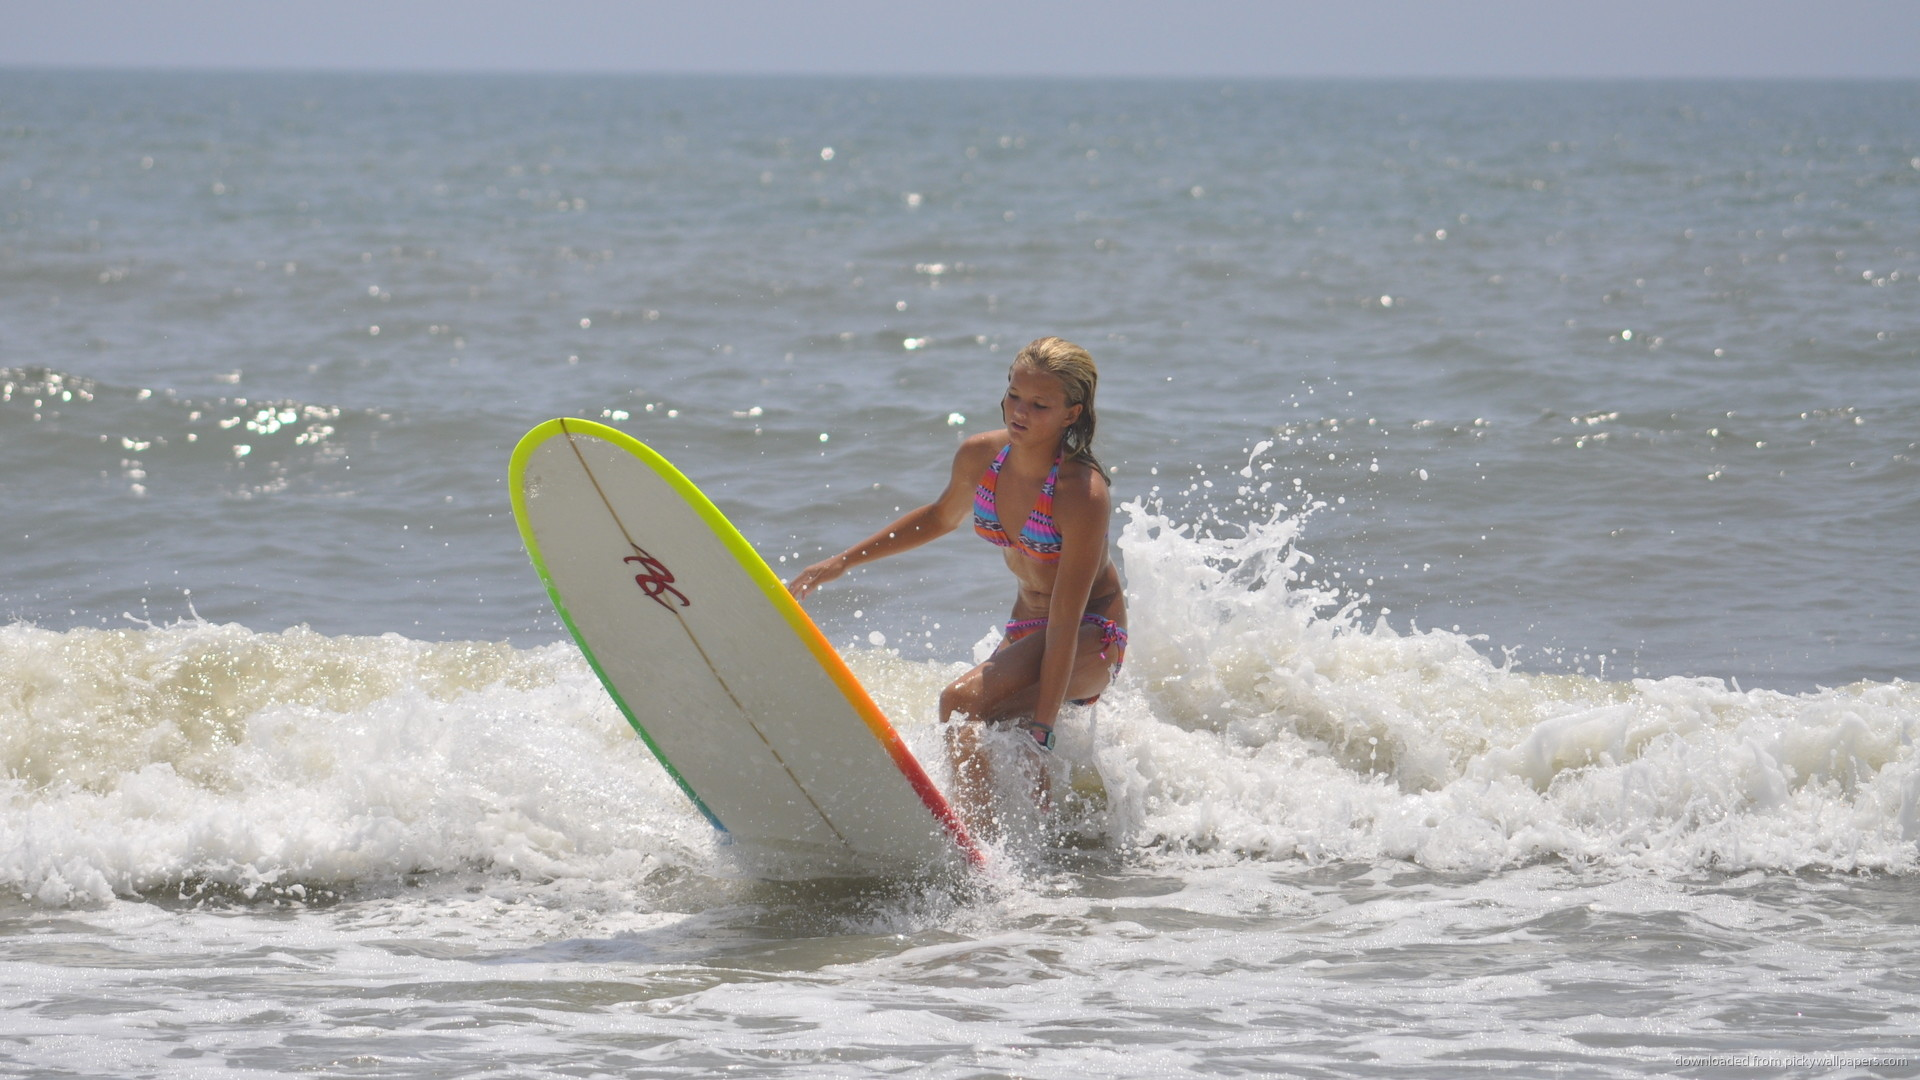 HD Surfer Girl wallpaper